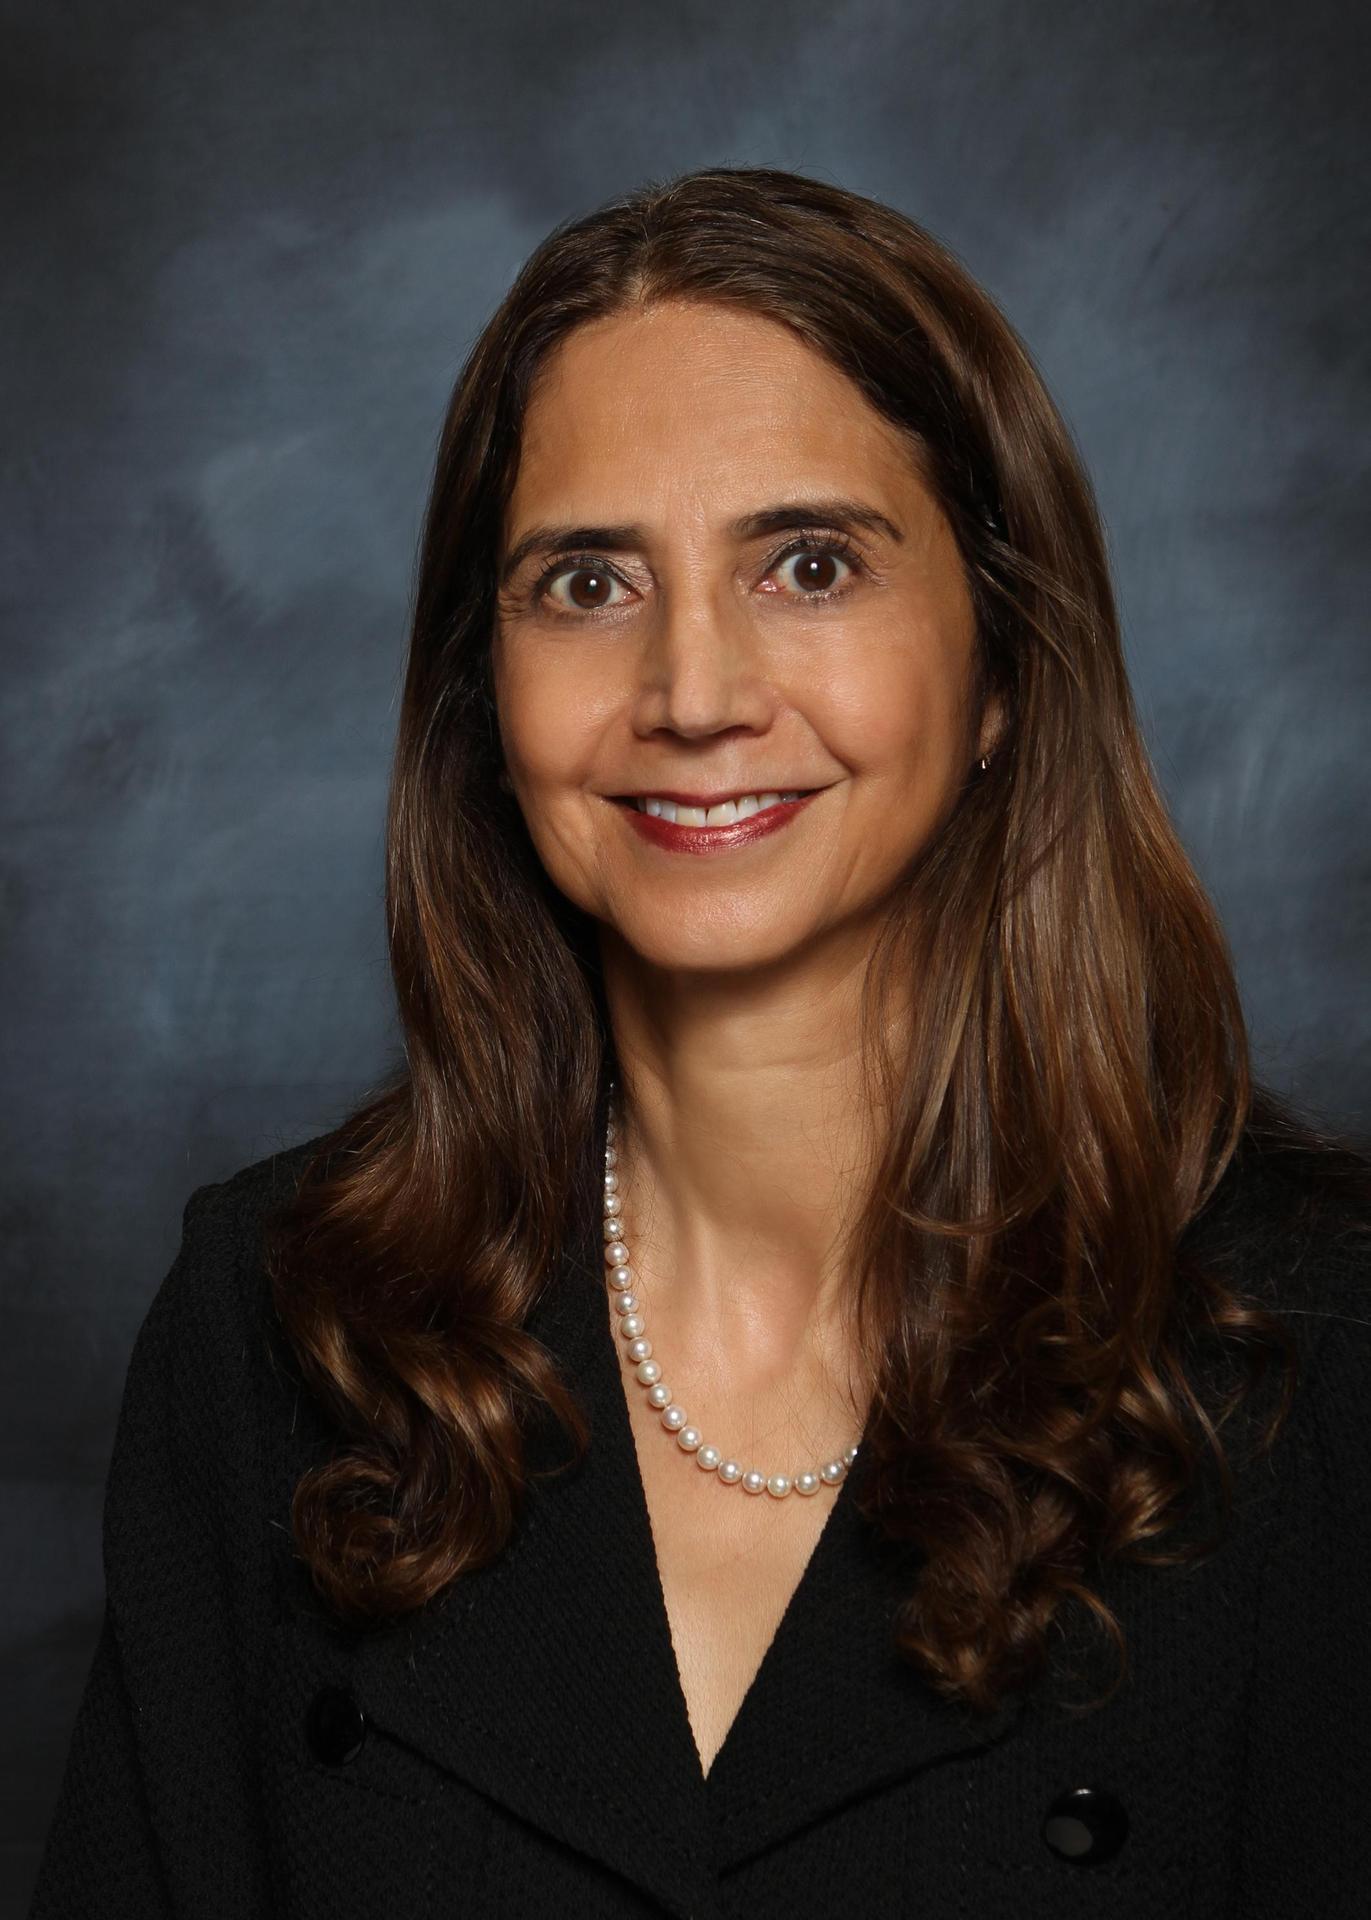 Dr. Thelma Melendez